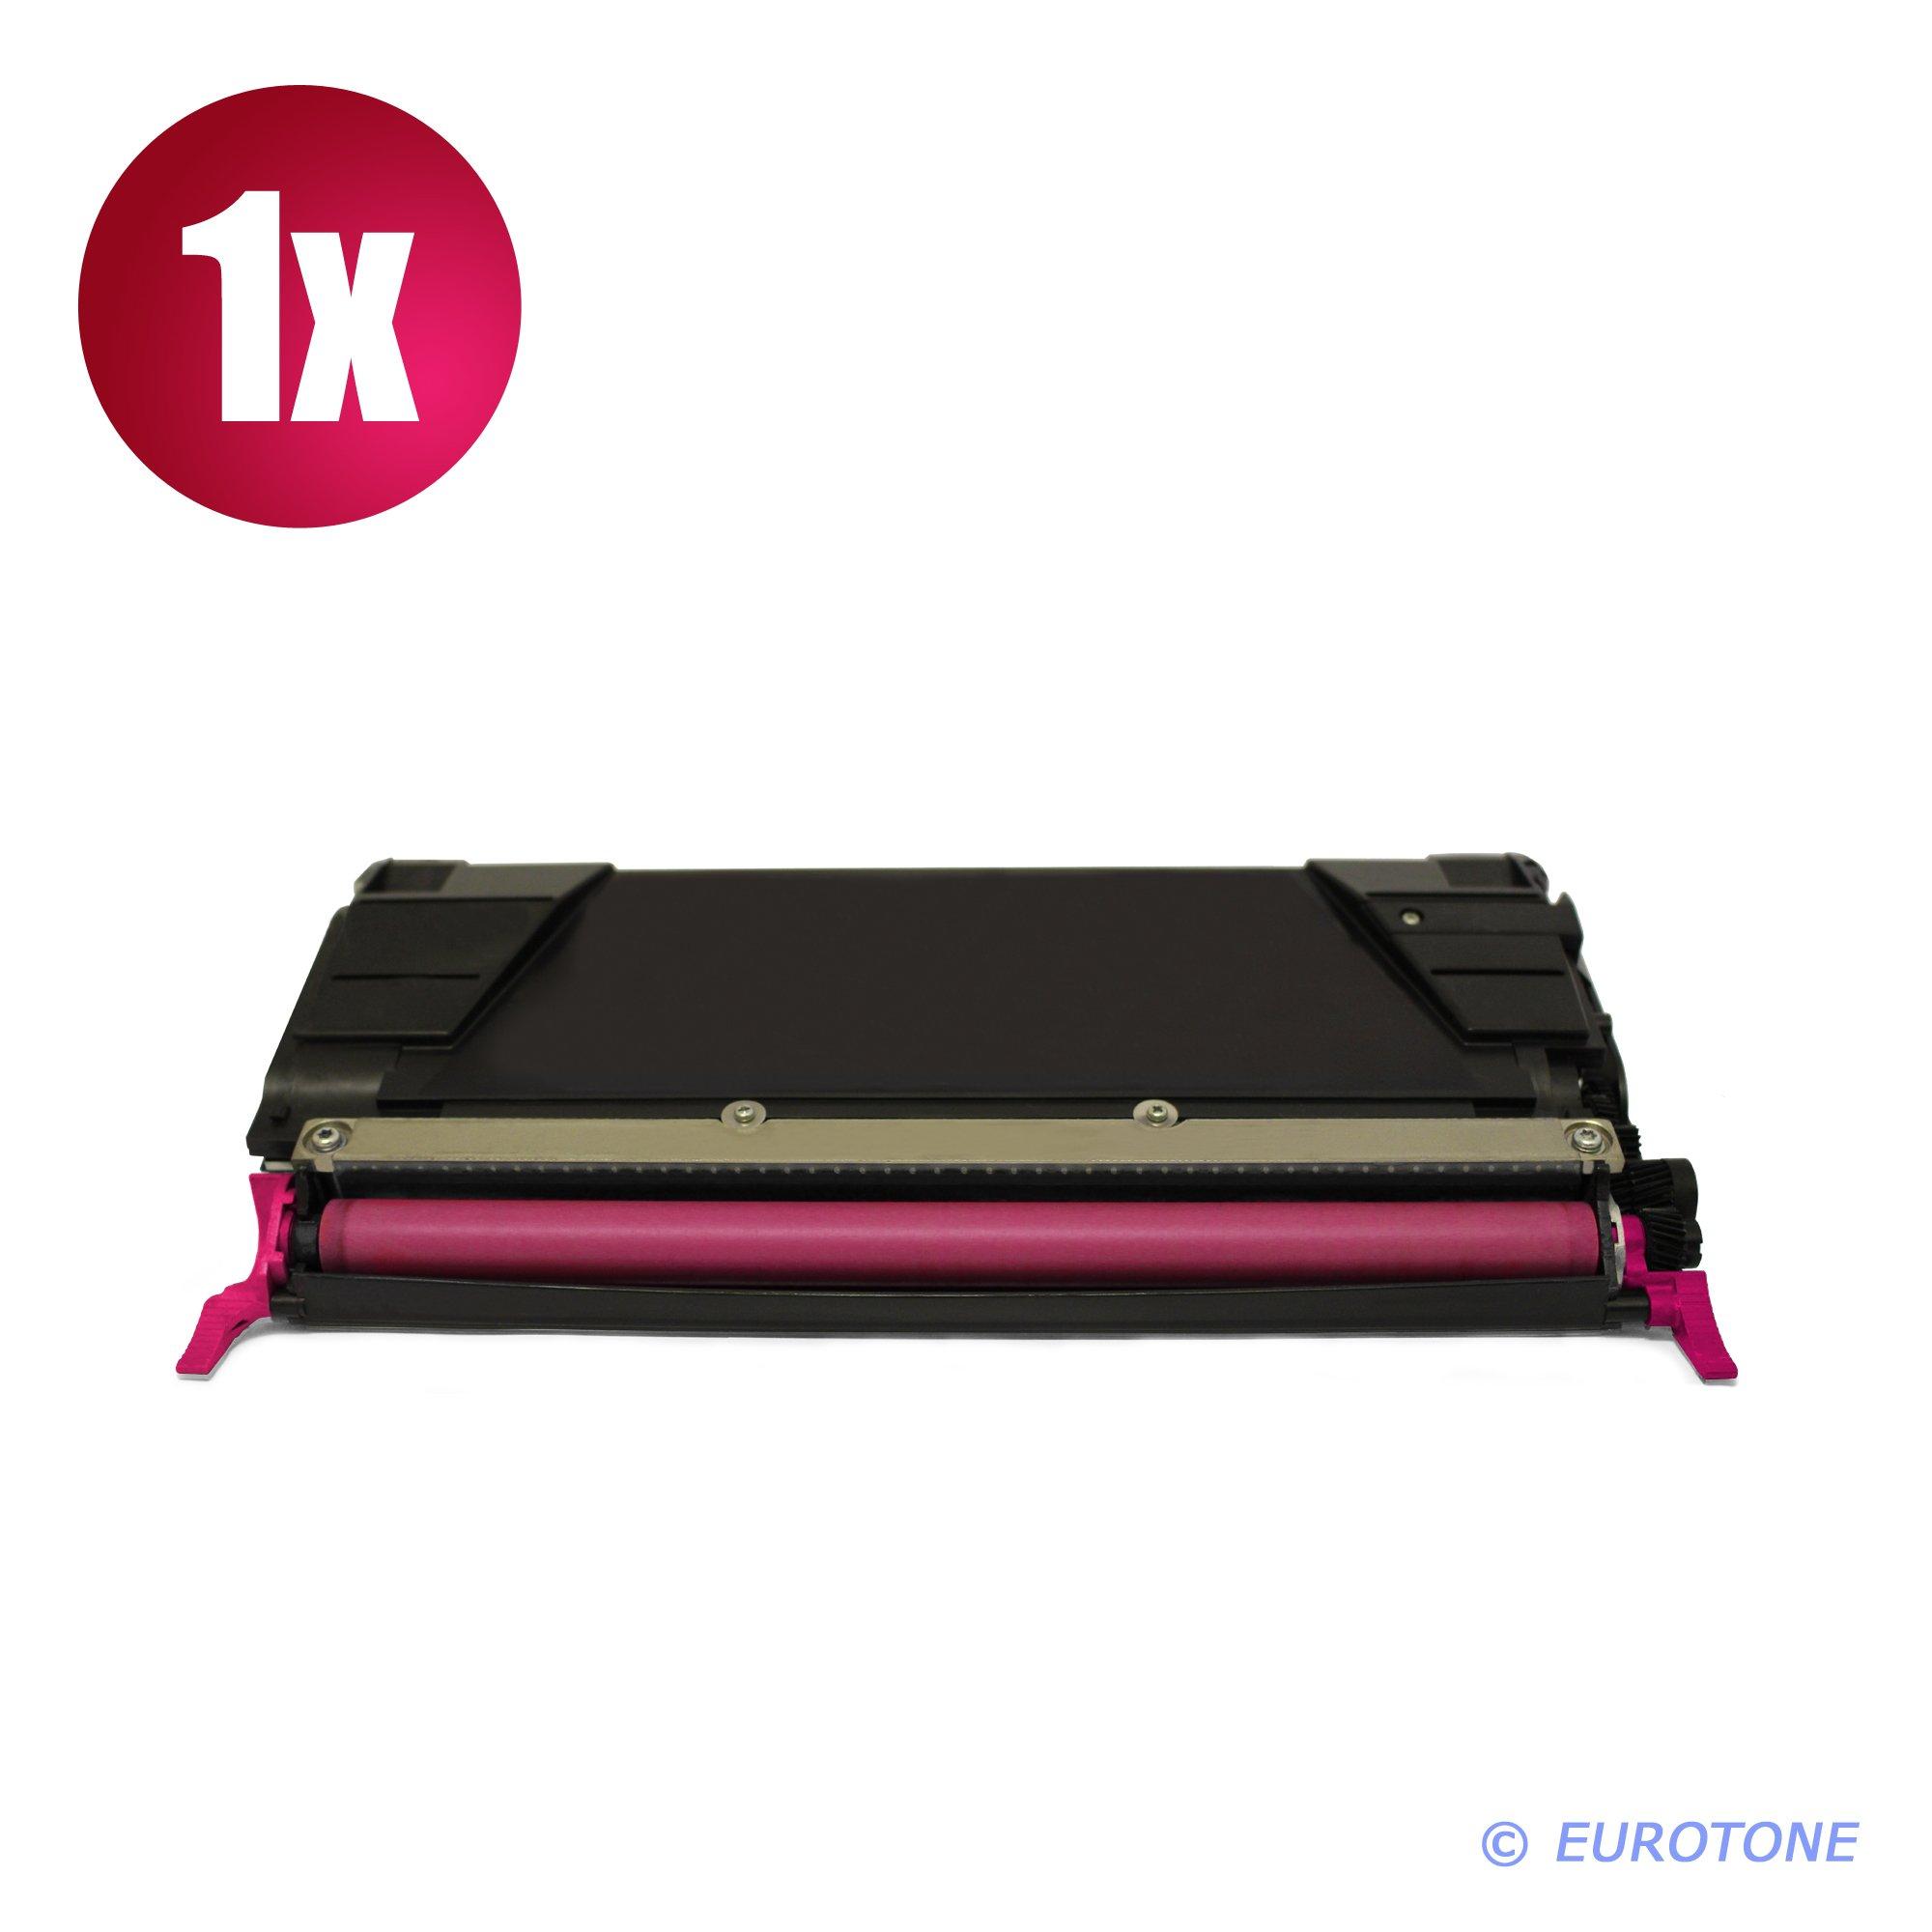 1x Eurotone Cartuccia Toner per Lexmark CS 736 dn sostituisce 0C736H1MG Rosso Magenta